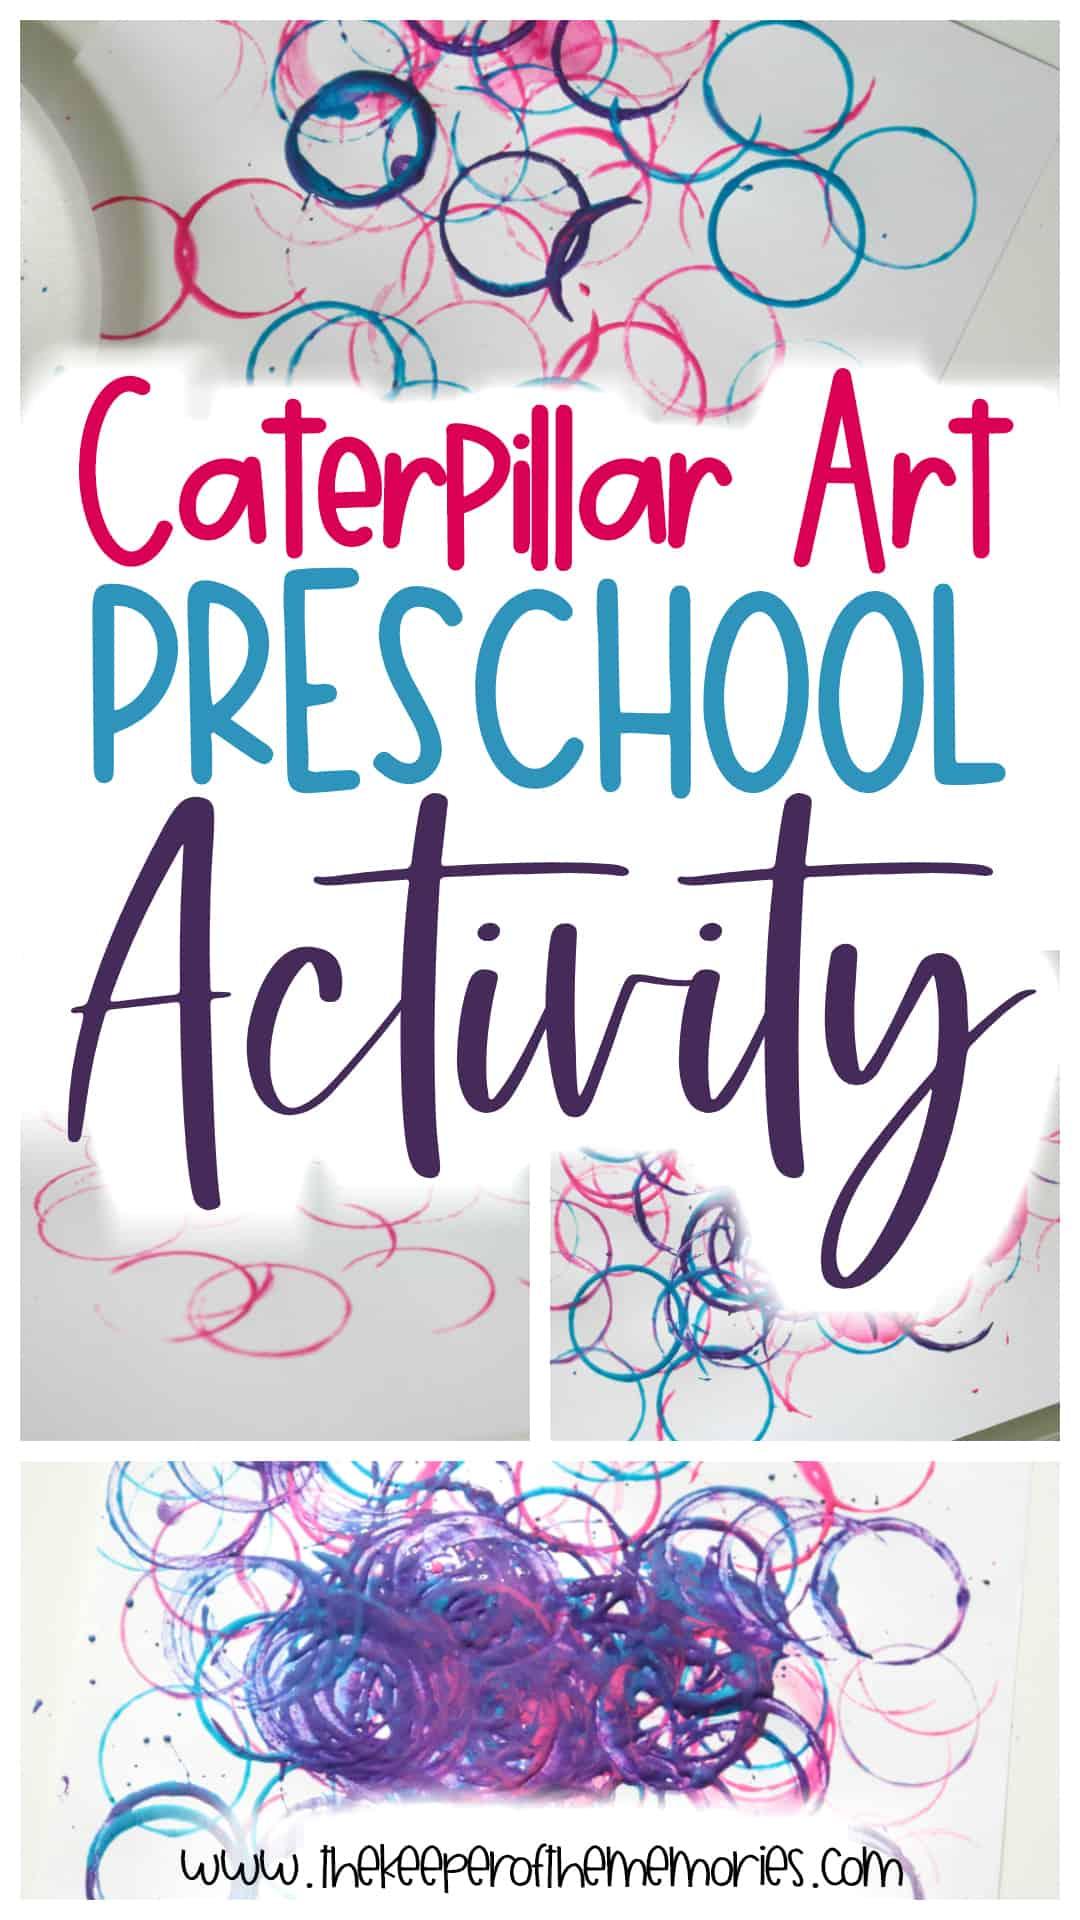 Caterpillar Art Preschool Activity